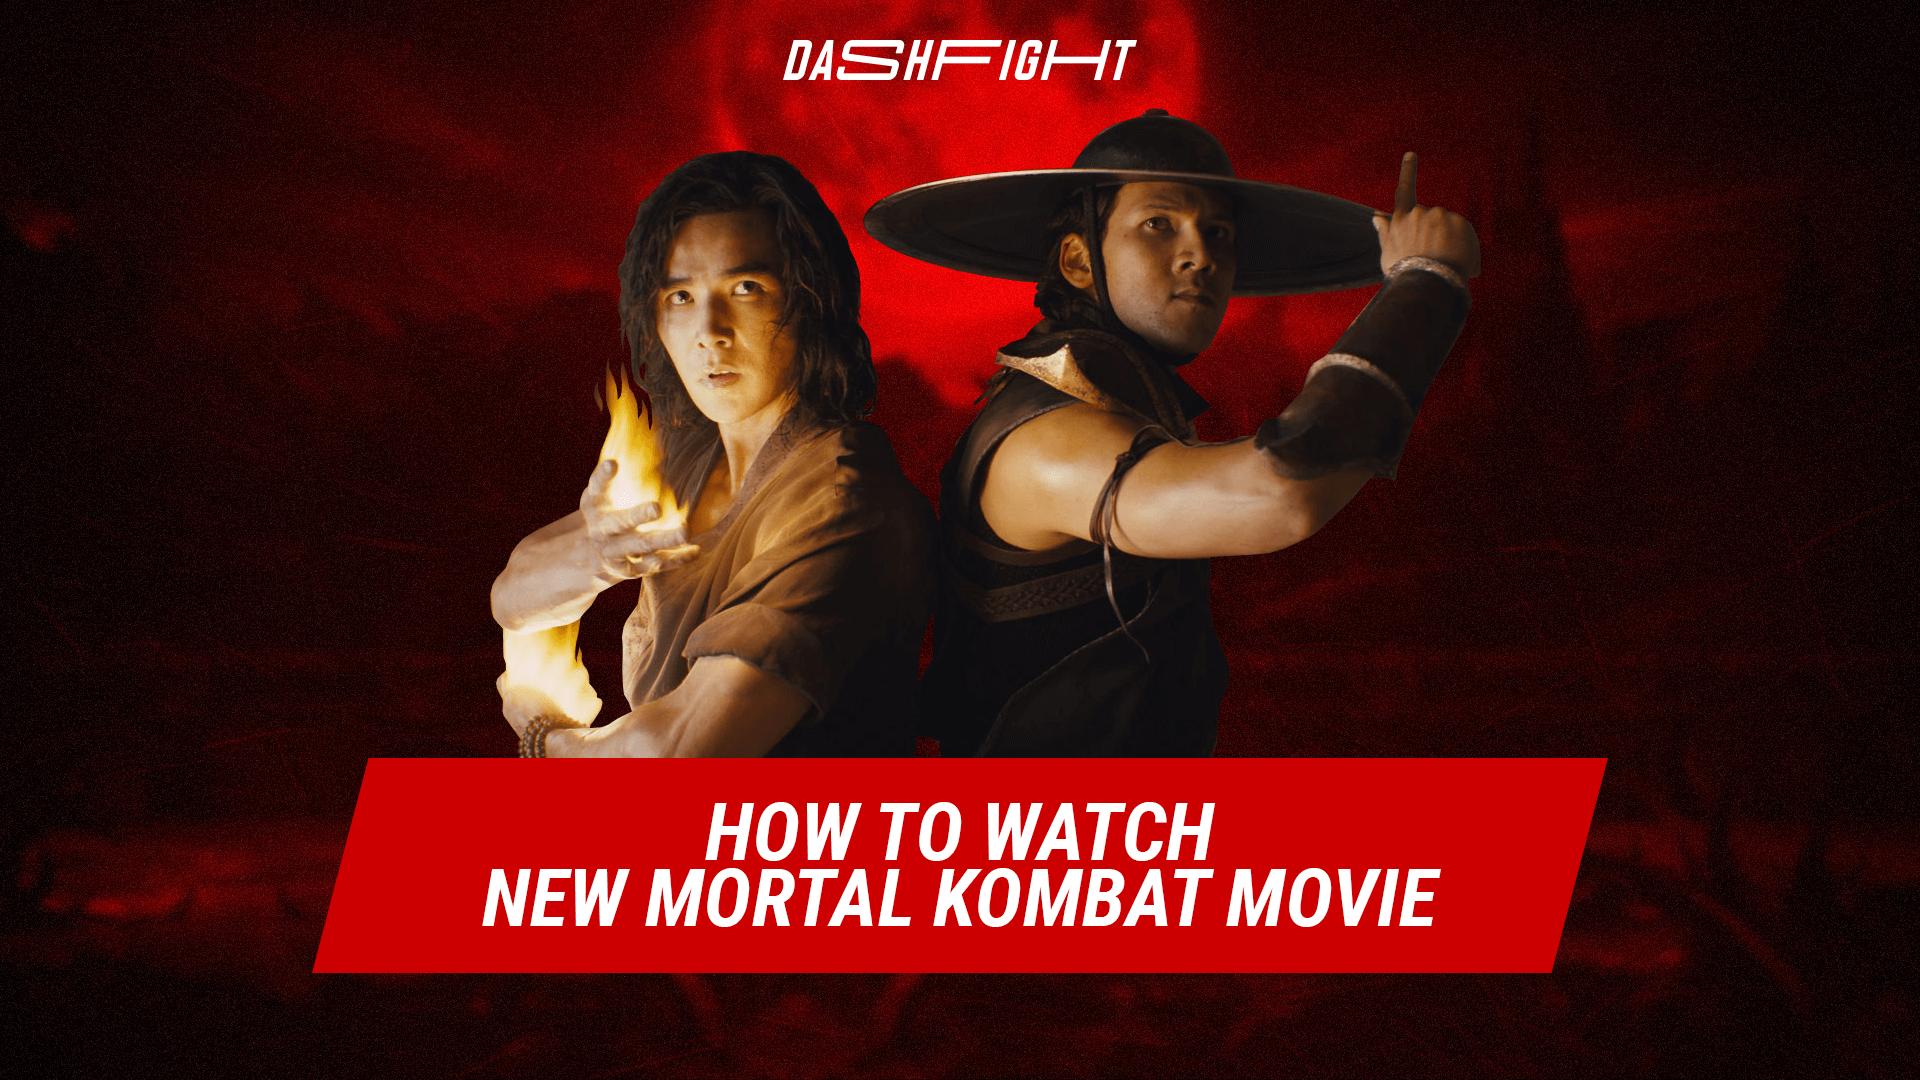 How to Watch New Mortal Kombat Movie